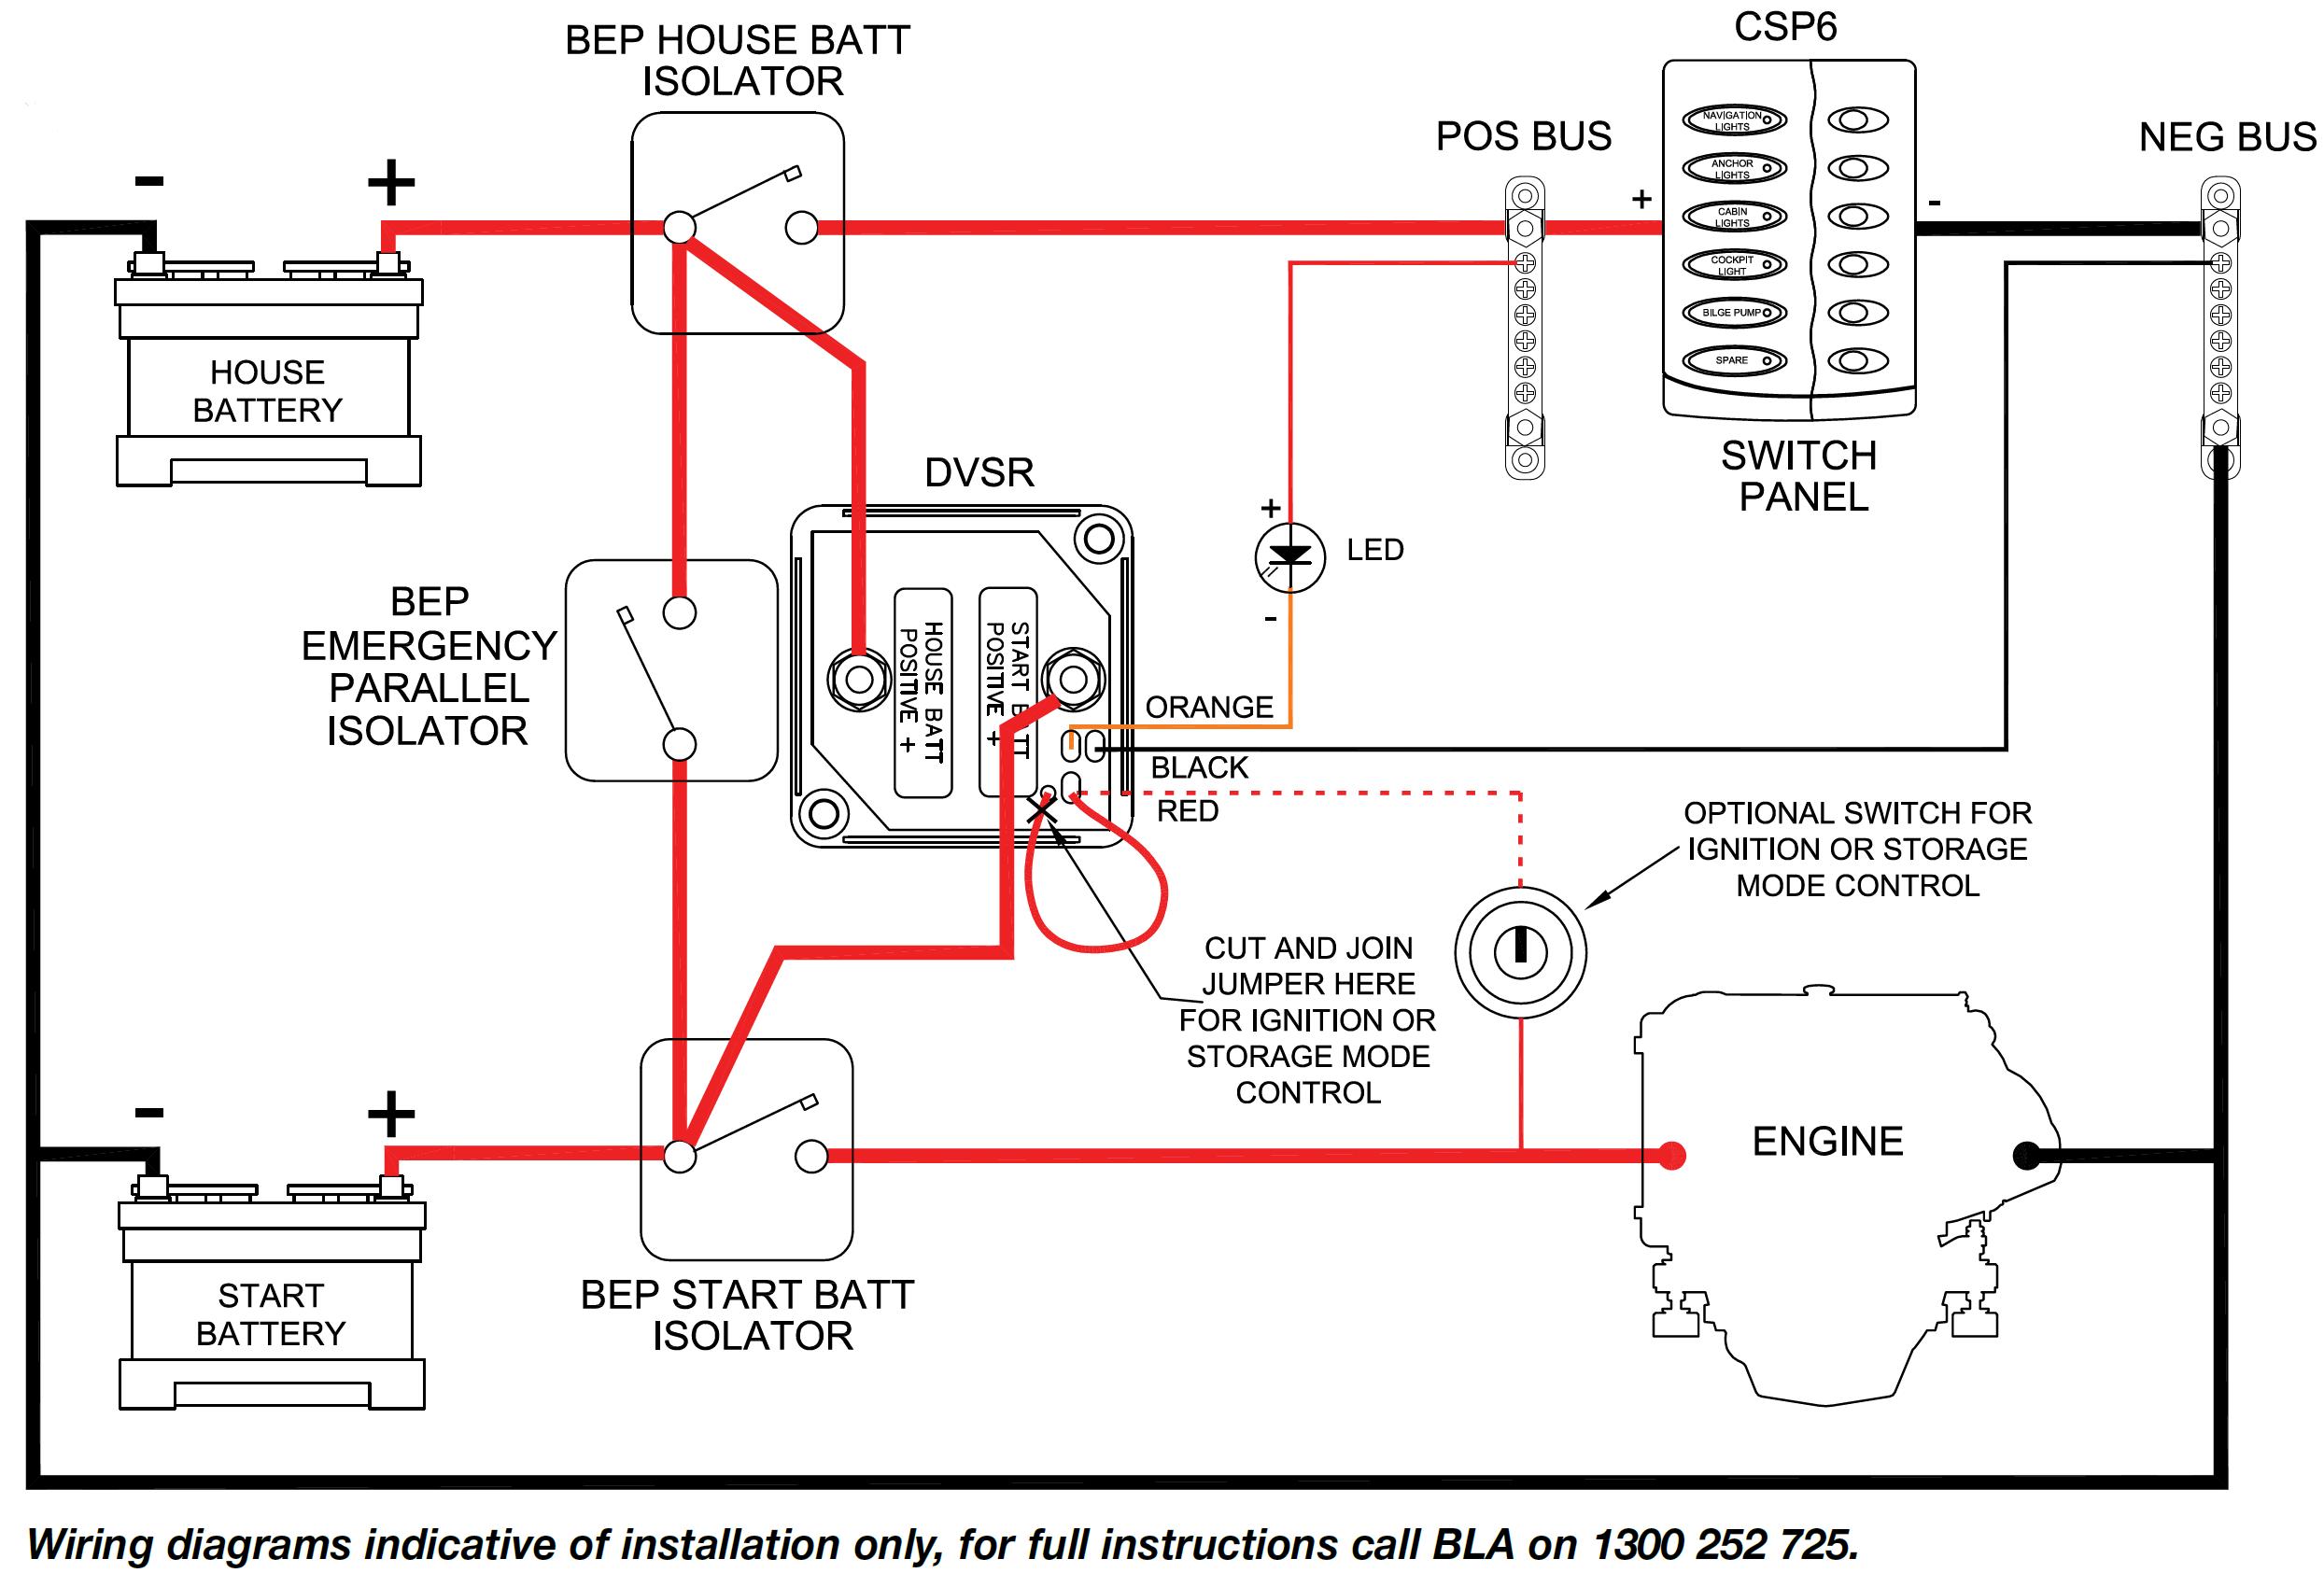 Bep Digital Voltage Sensing Relay - Dvsr